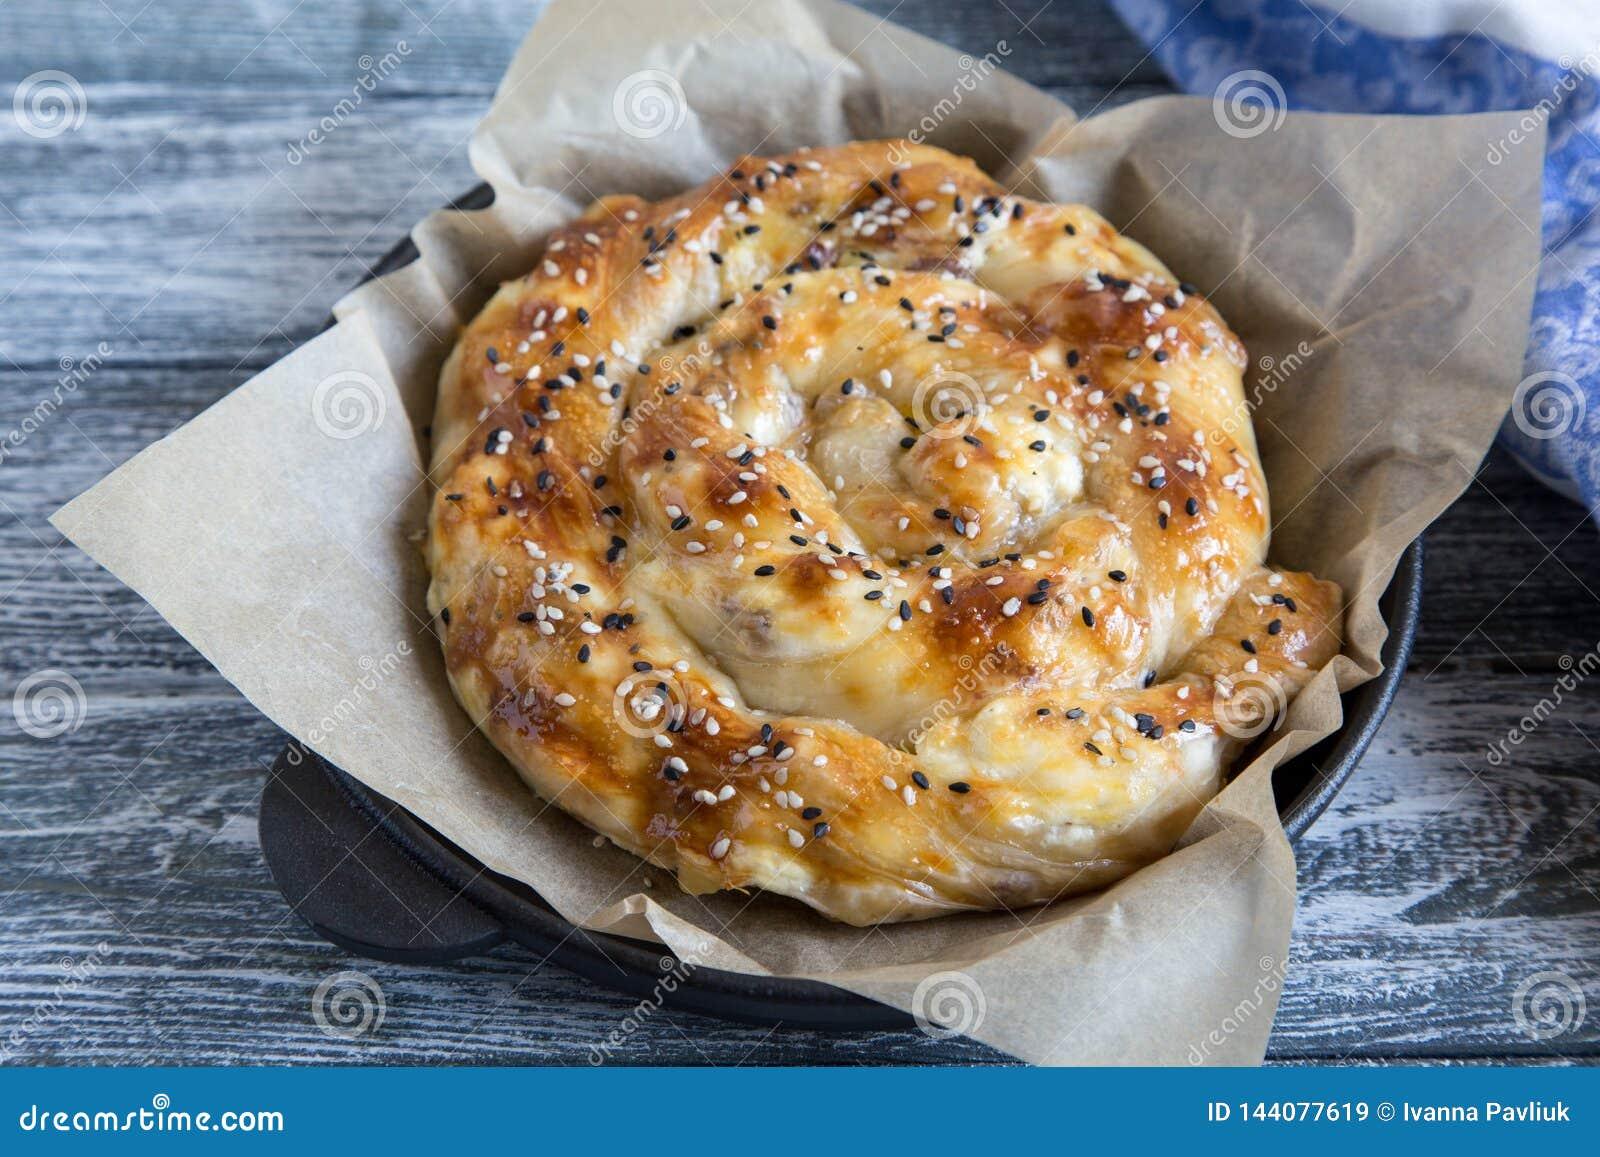 Vertuta, παραδοσιακή ρουμανική, μολδαβική ή βαλκανική πίτα ψησίματος Σπειροειδής πίτα ζύμης filo